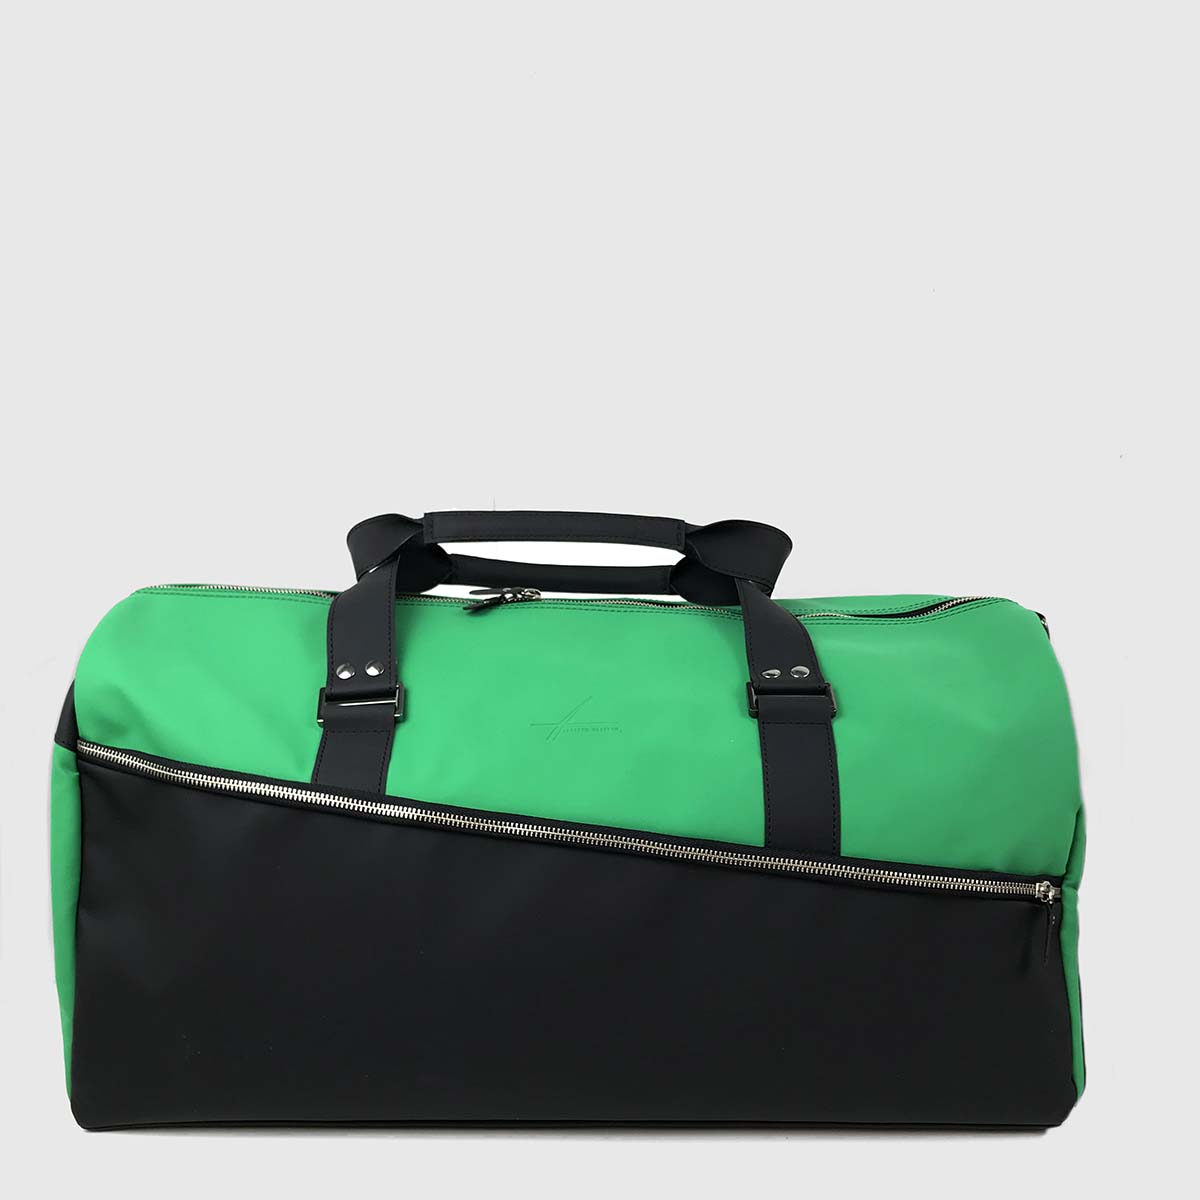 Green & Black Technical Leather Duffle-bag